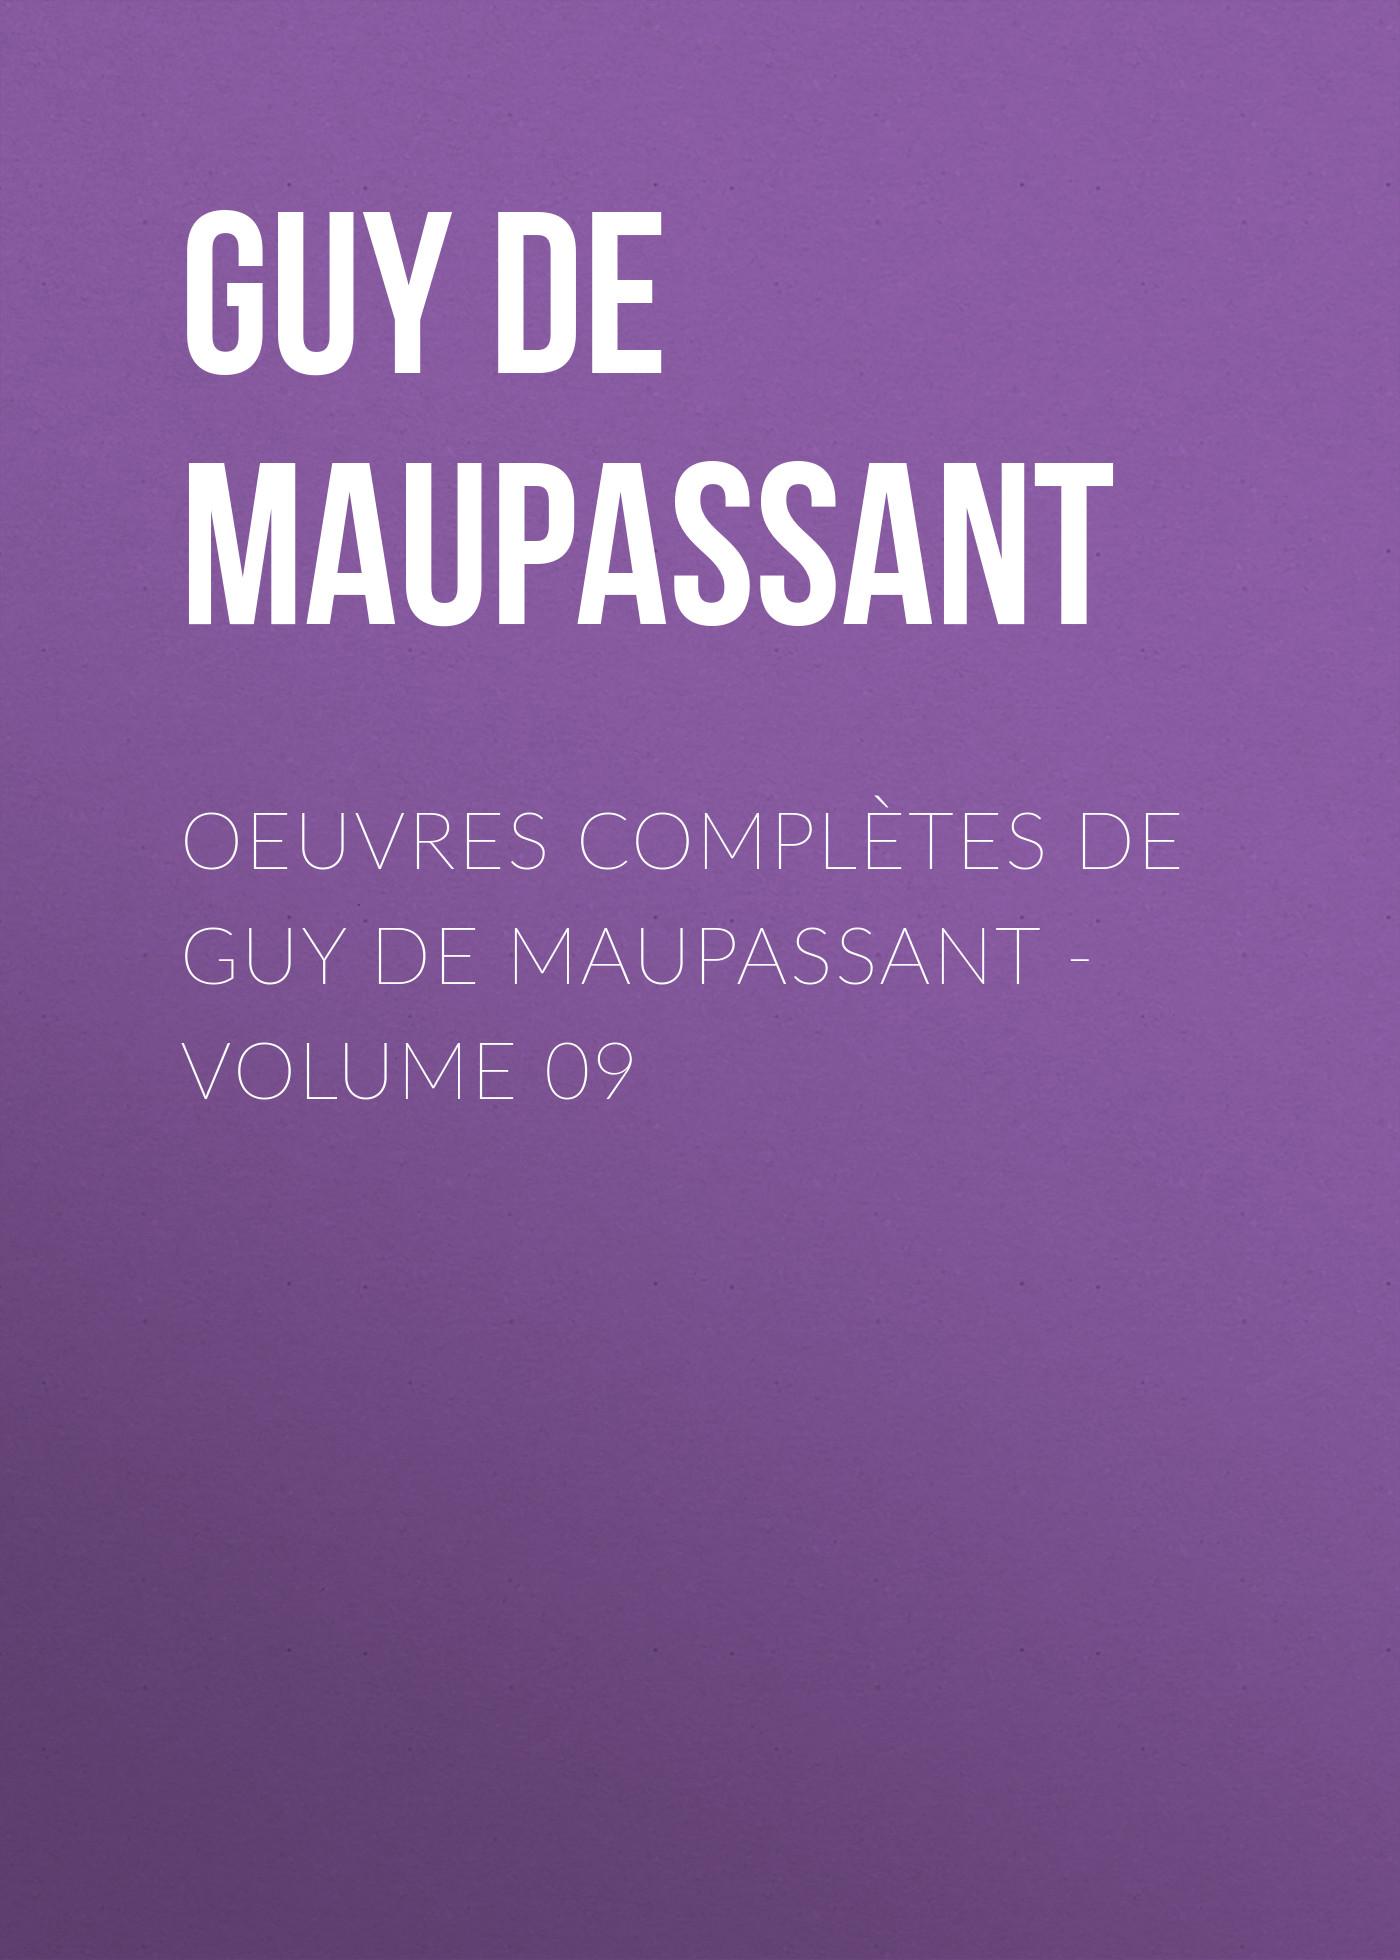 Ги де Мопассан OEuvres complètes de Guy de Maupassant - volume 09 ги де мопассан œuvres complètes de guy de maupassant volume 03